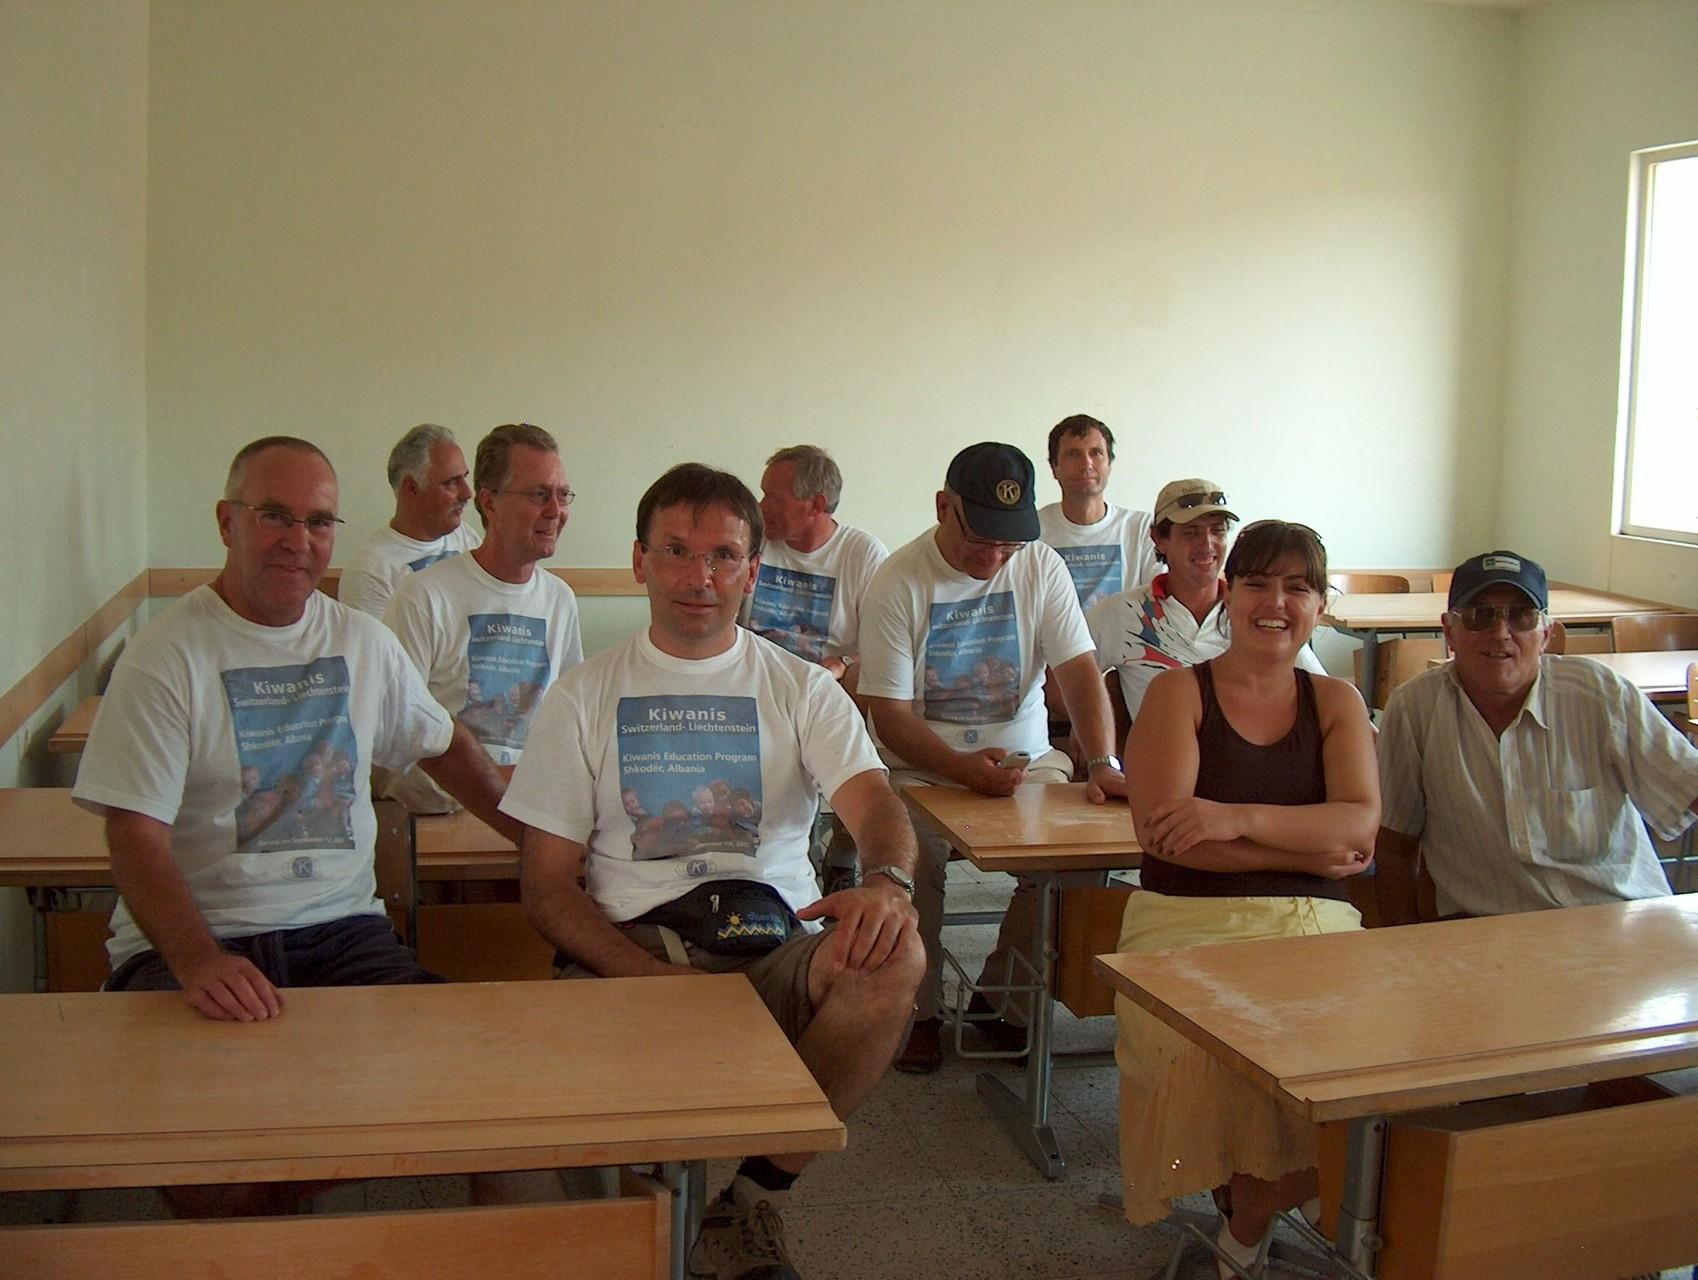 ed il team da Kiwanis dalla Svizra